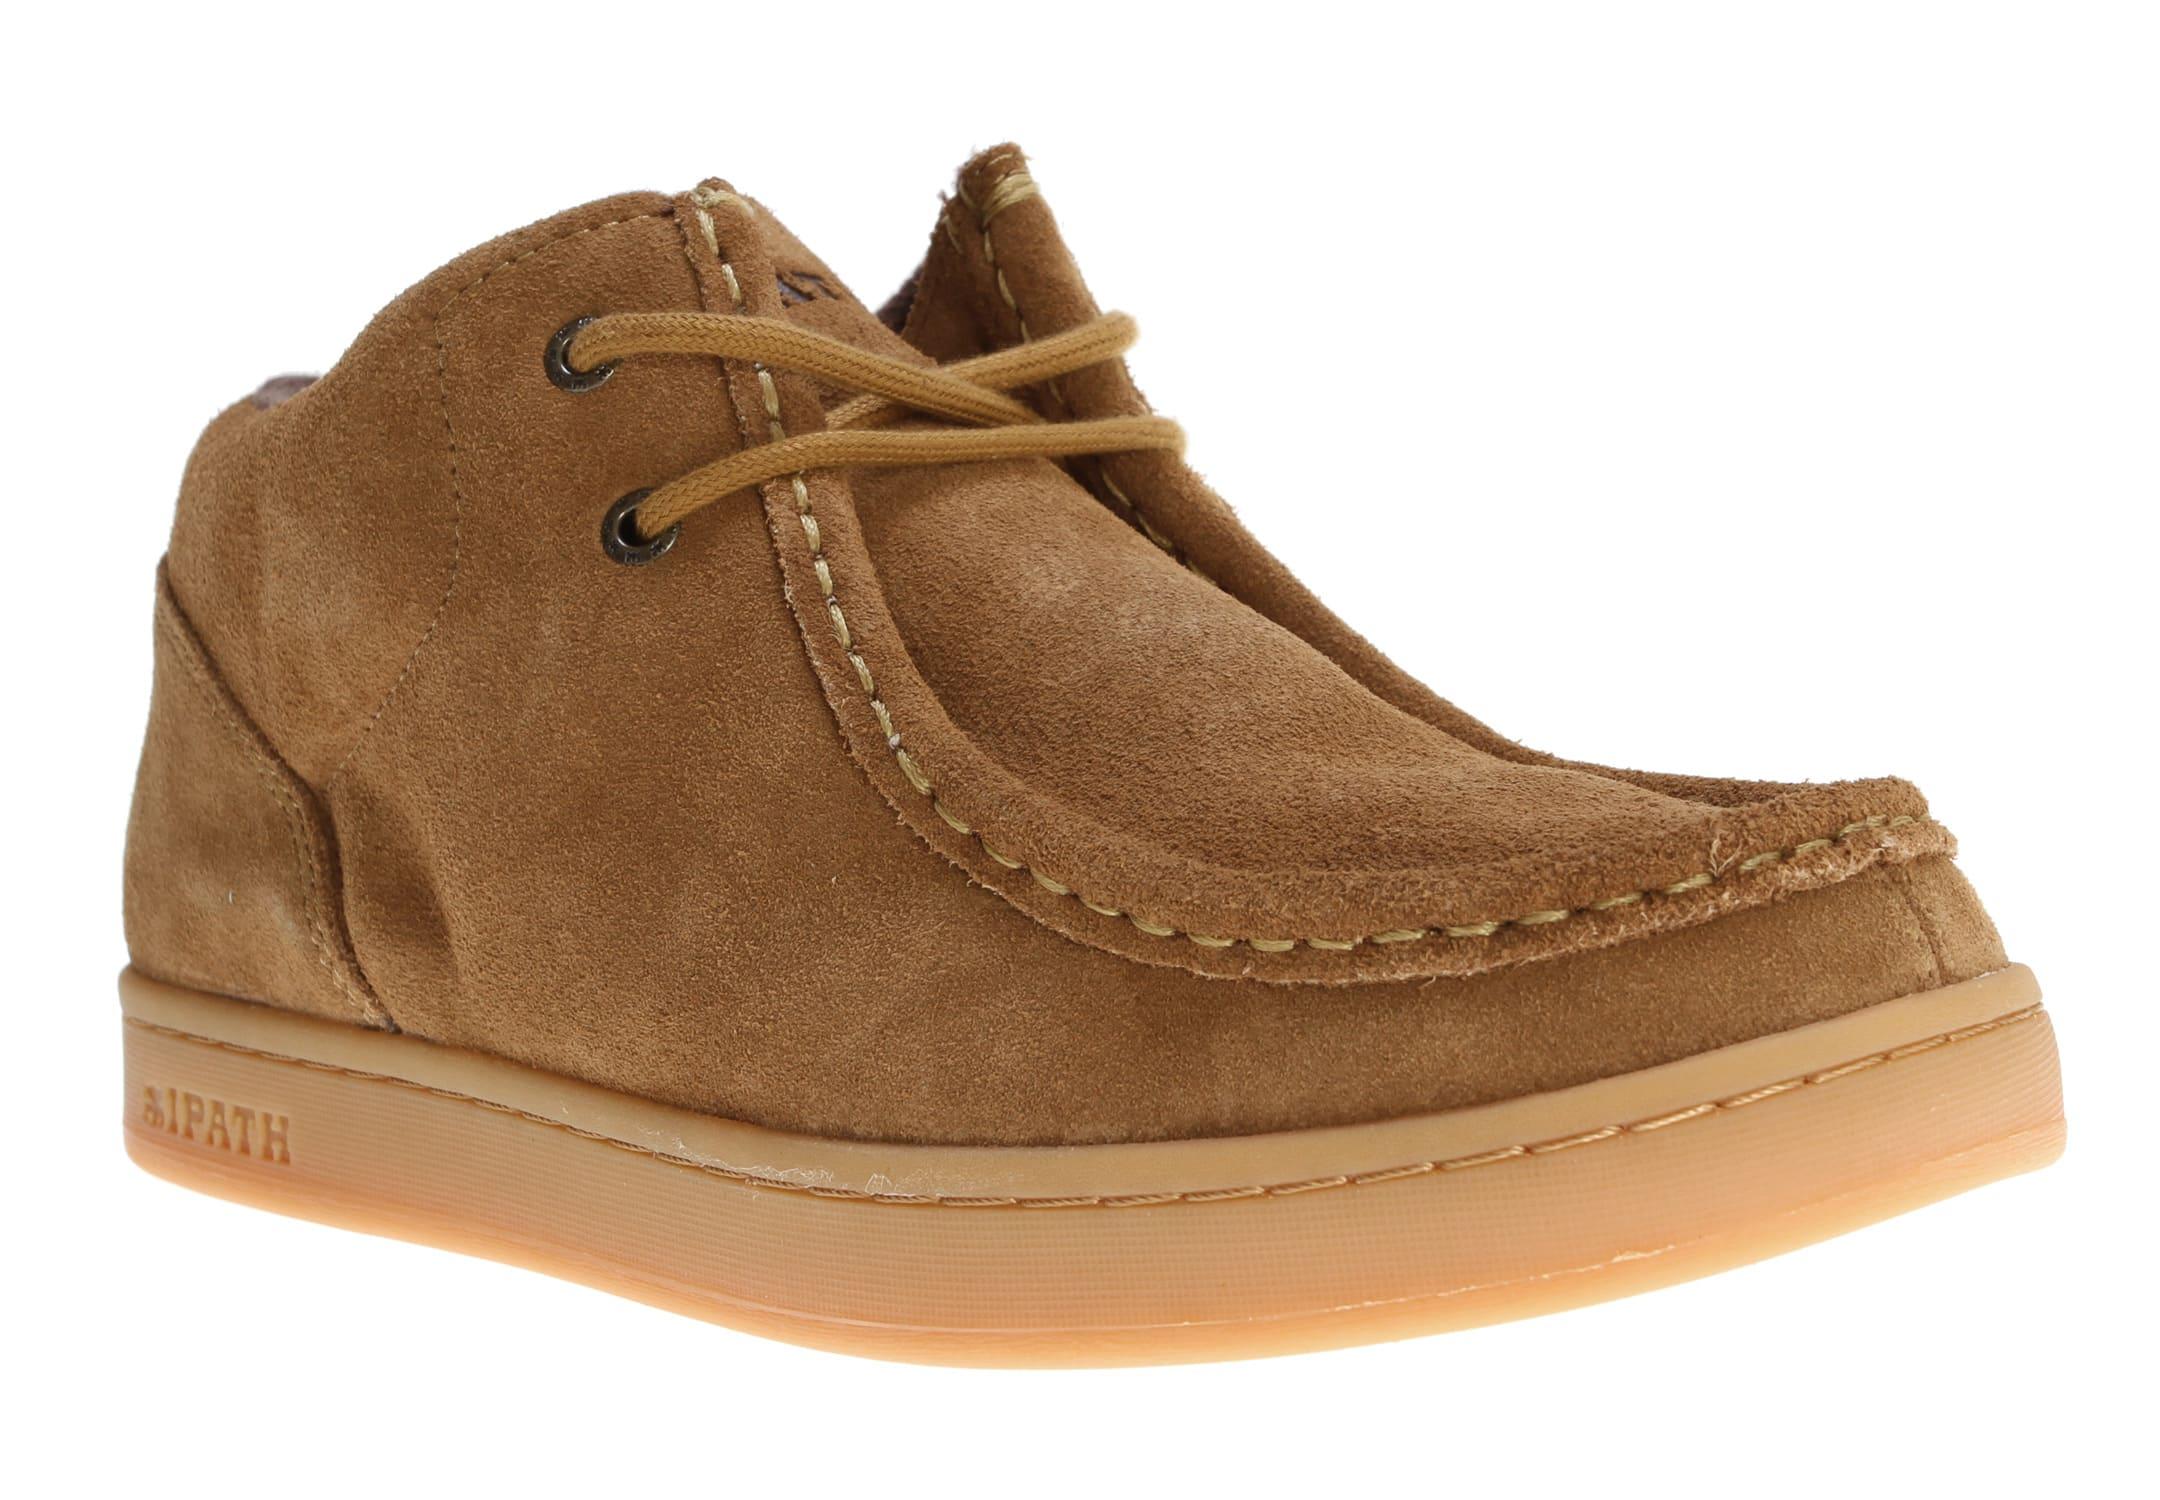 9cd1b1bfb6 Ipath Cat Skate Shoes - thumbnail 2